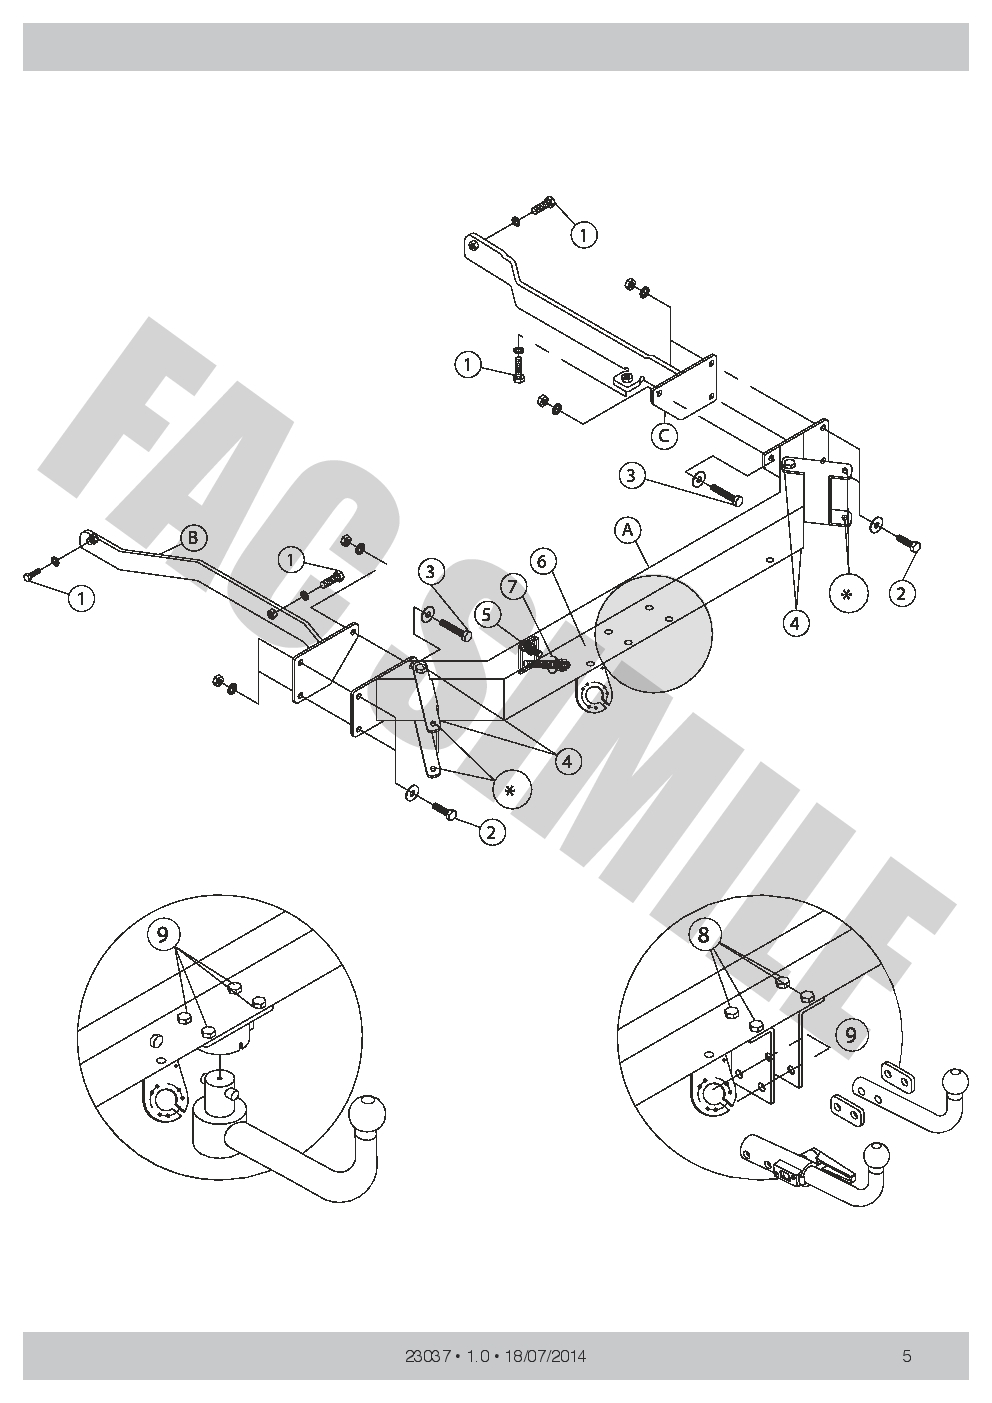 Mercedes Clk Relay Diagram Detailed Schematics W209 Fuse Box Largest Wiring Database U2022 2016